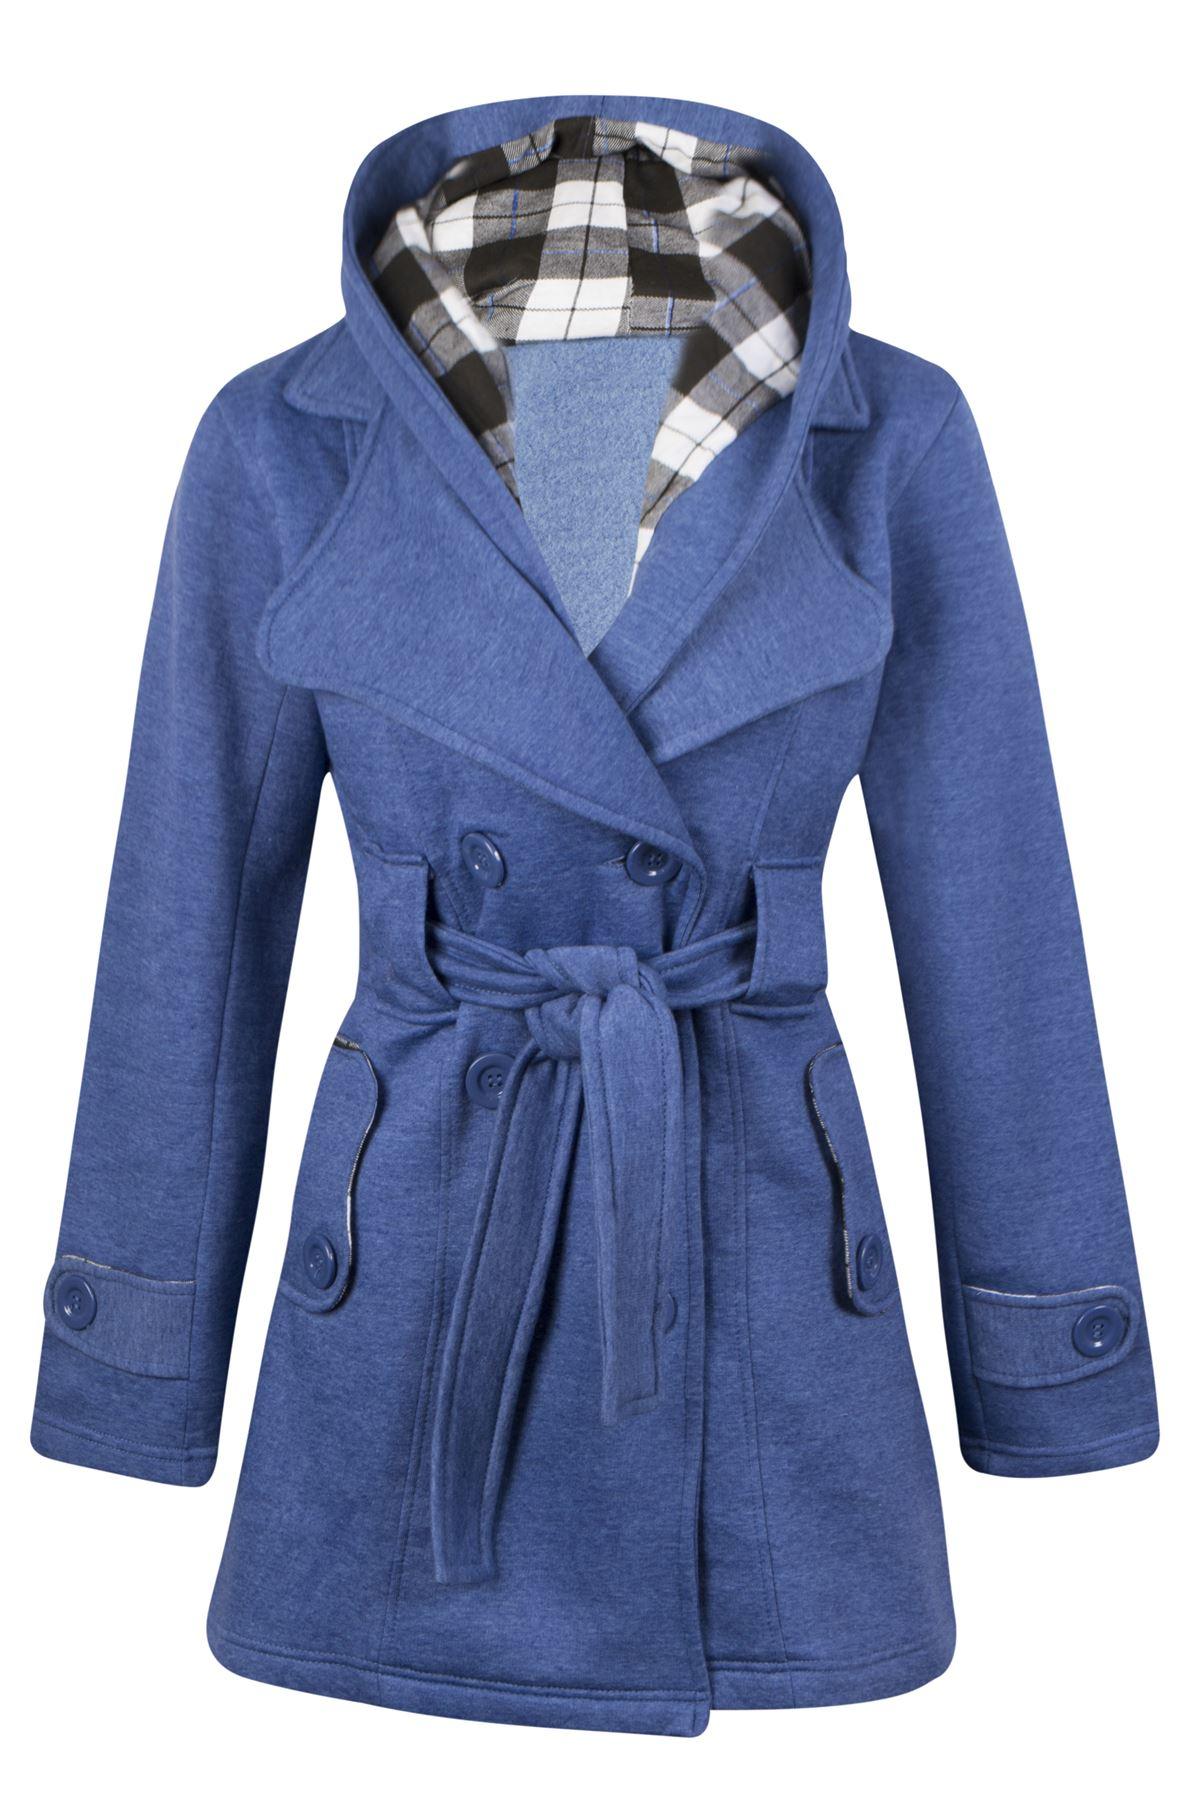 Ebay Sheepskin Womens Coats Size Large American Go Association